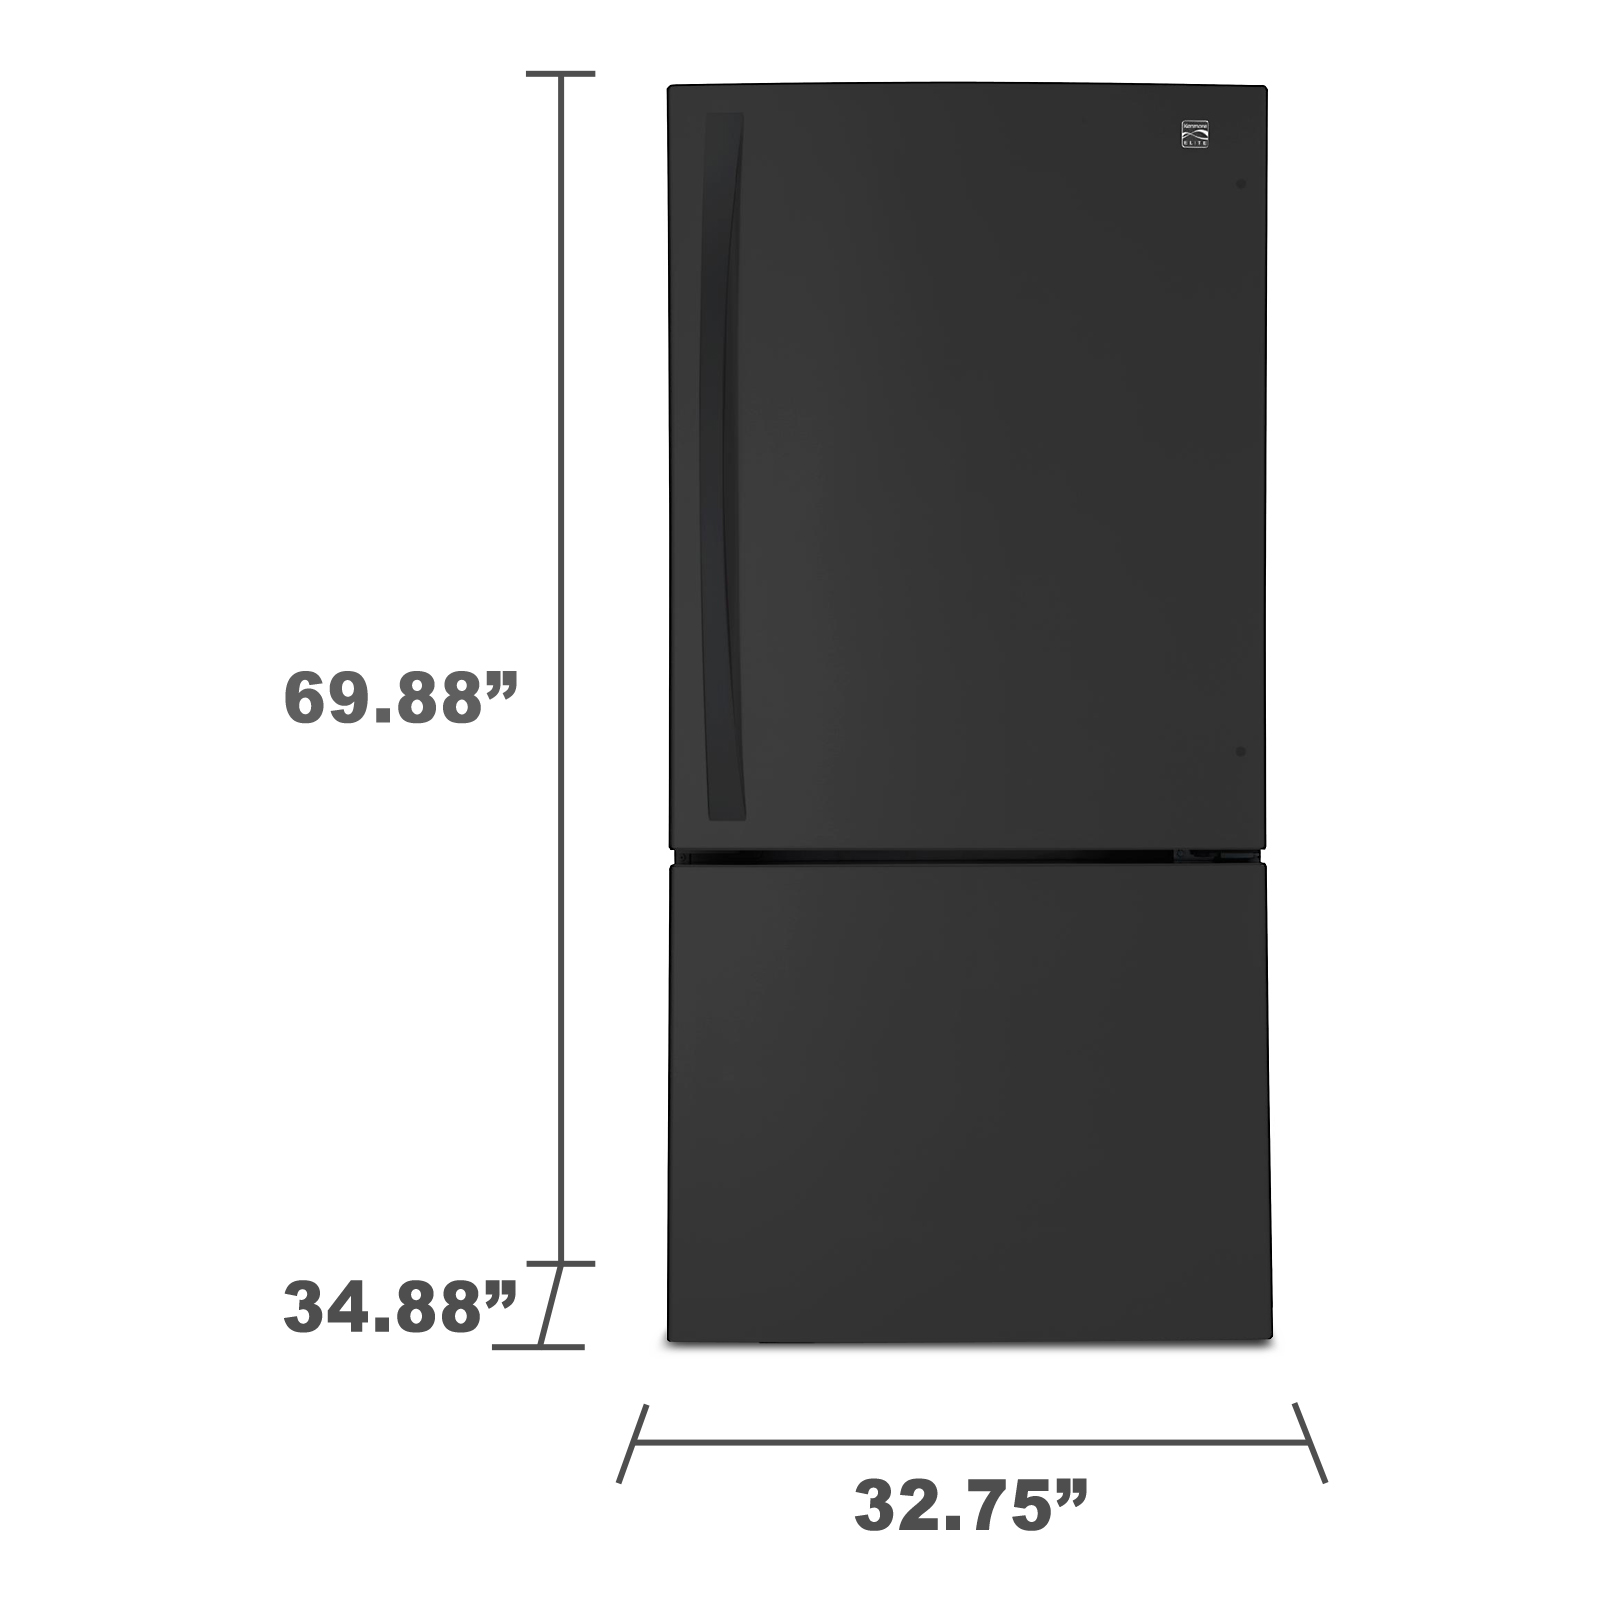 Kenmore Elite 24.1 cu. ft. Bottom-Freezer Refrigerator - Black